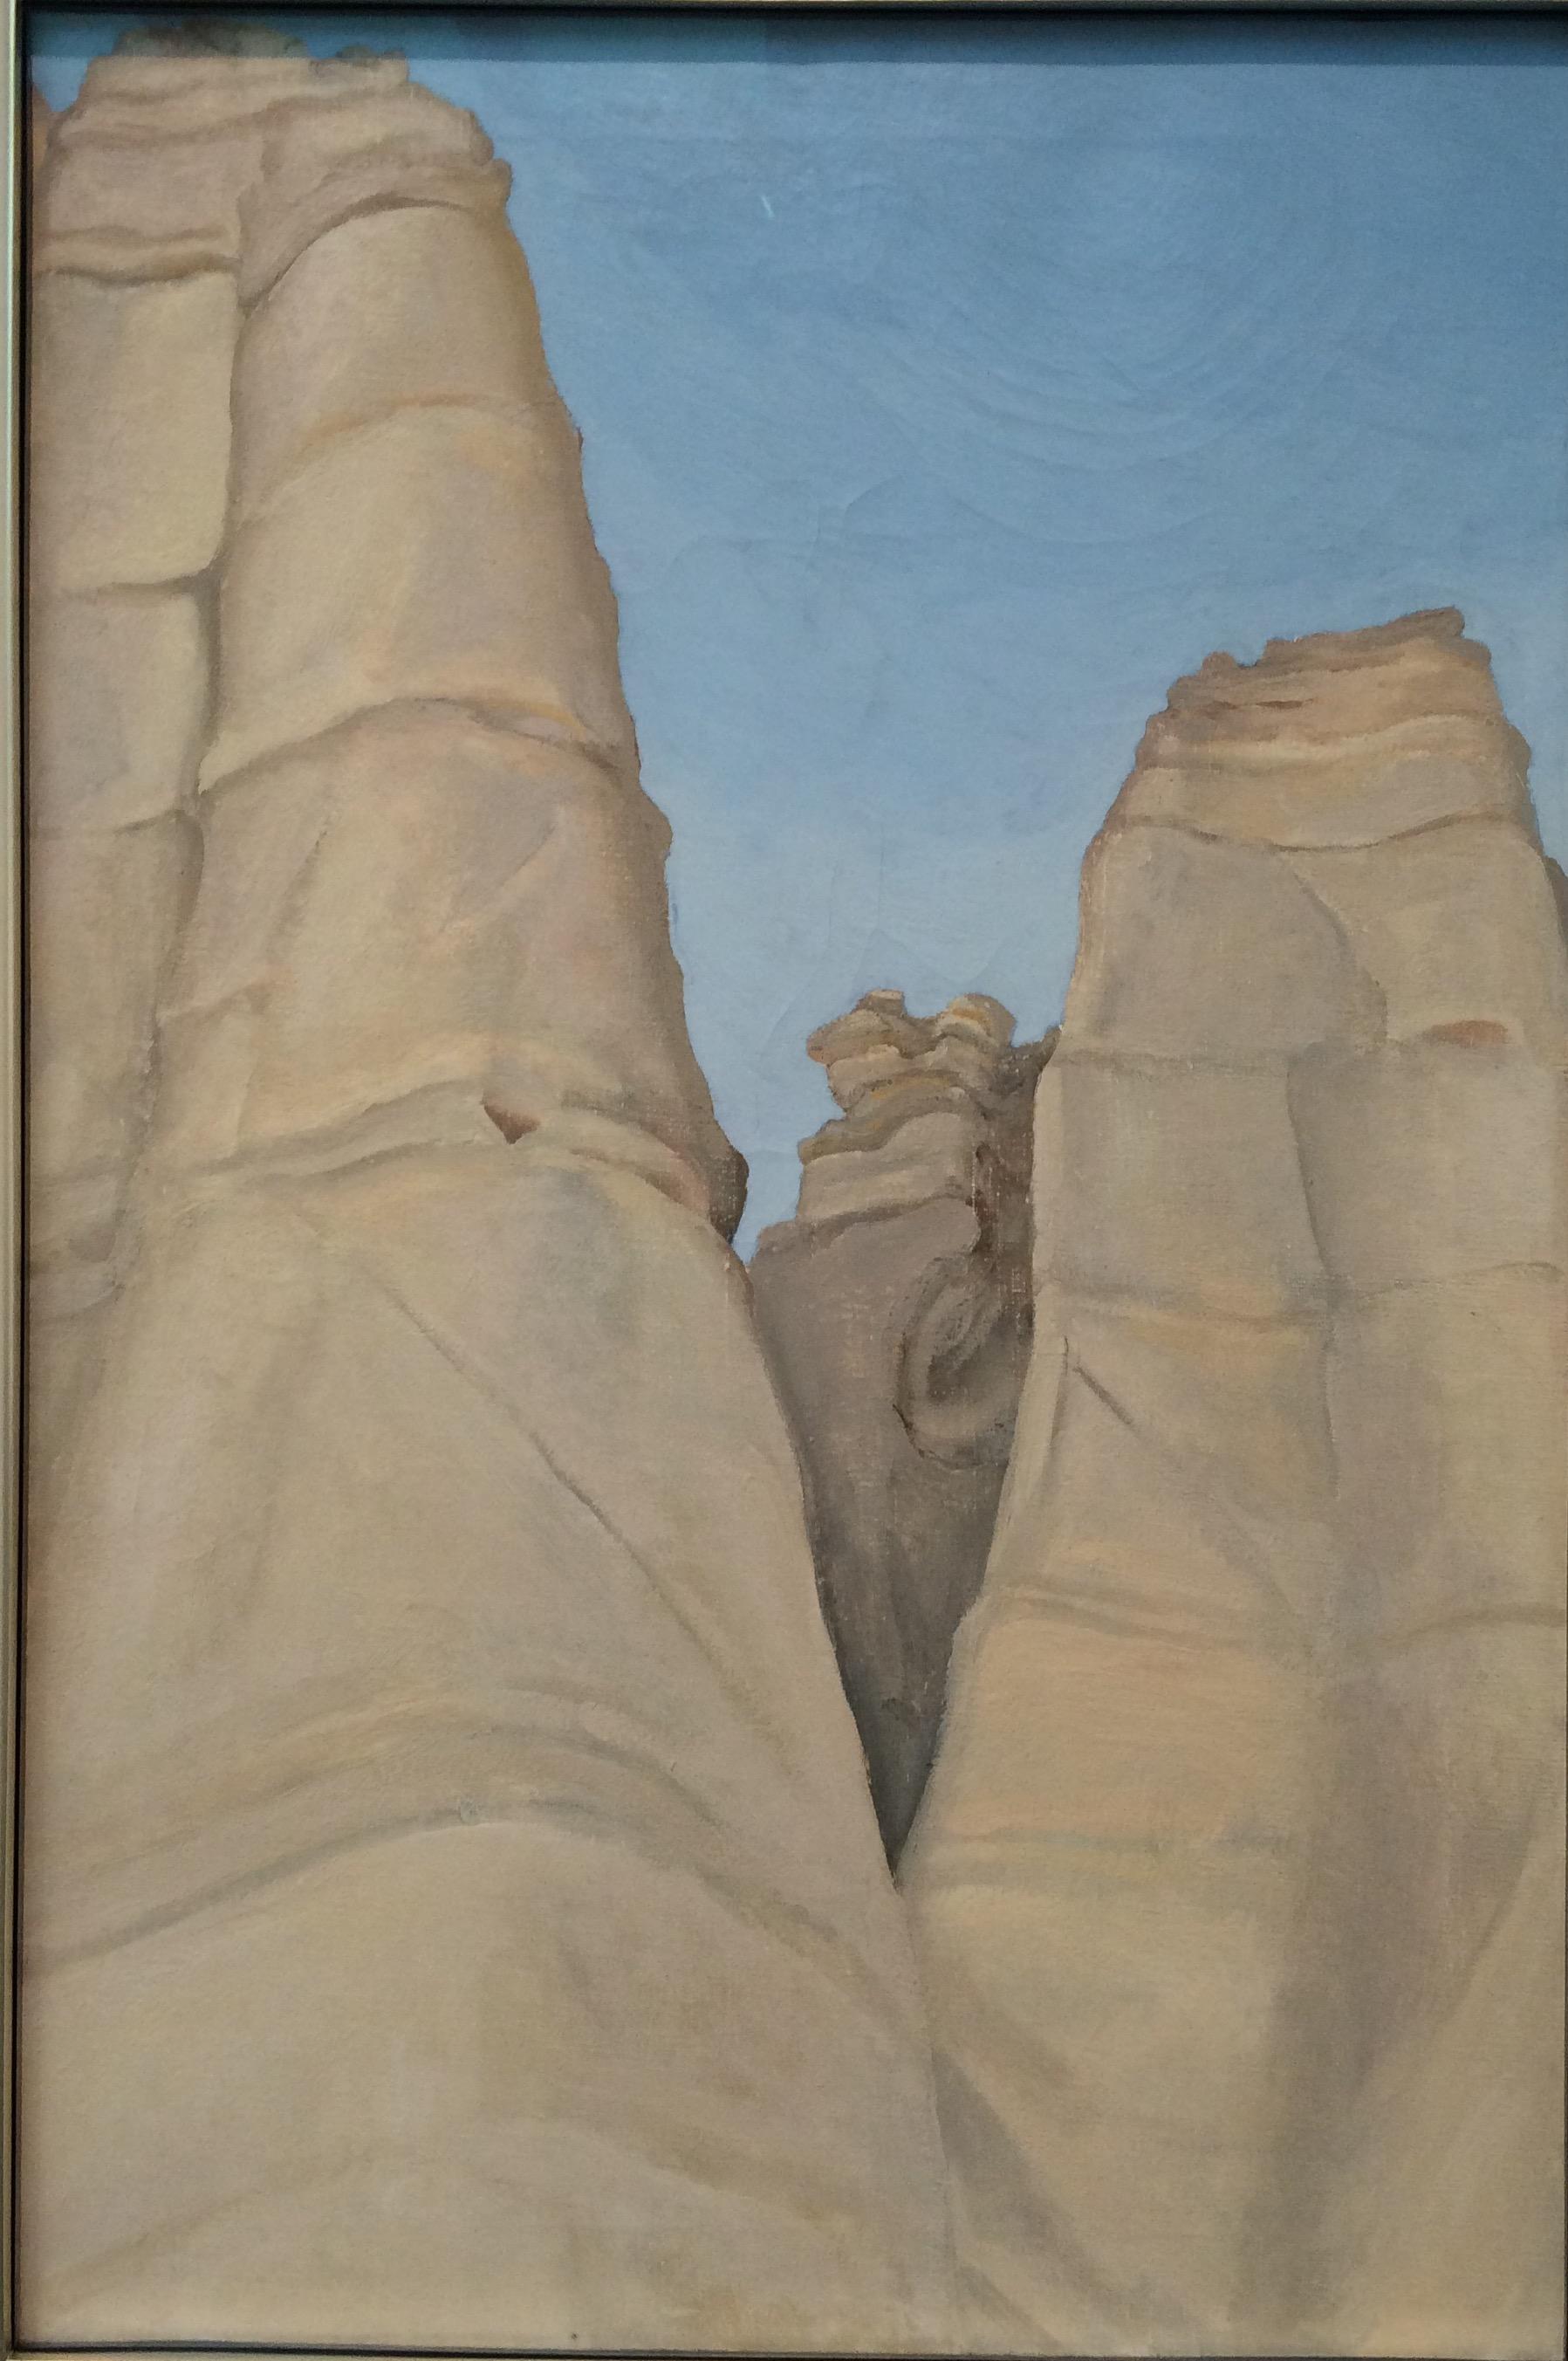 Georgia O'Keeffe,Plaza Blanca, The White Place. O'Keeffe Museum, Santa Fe.